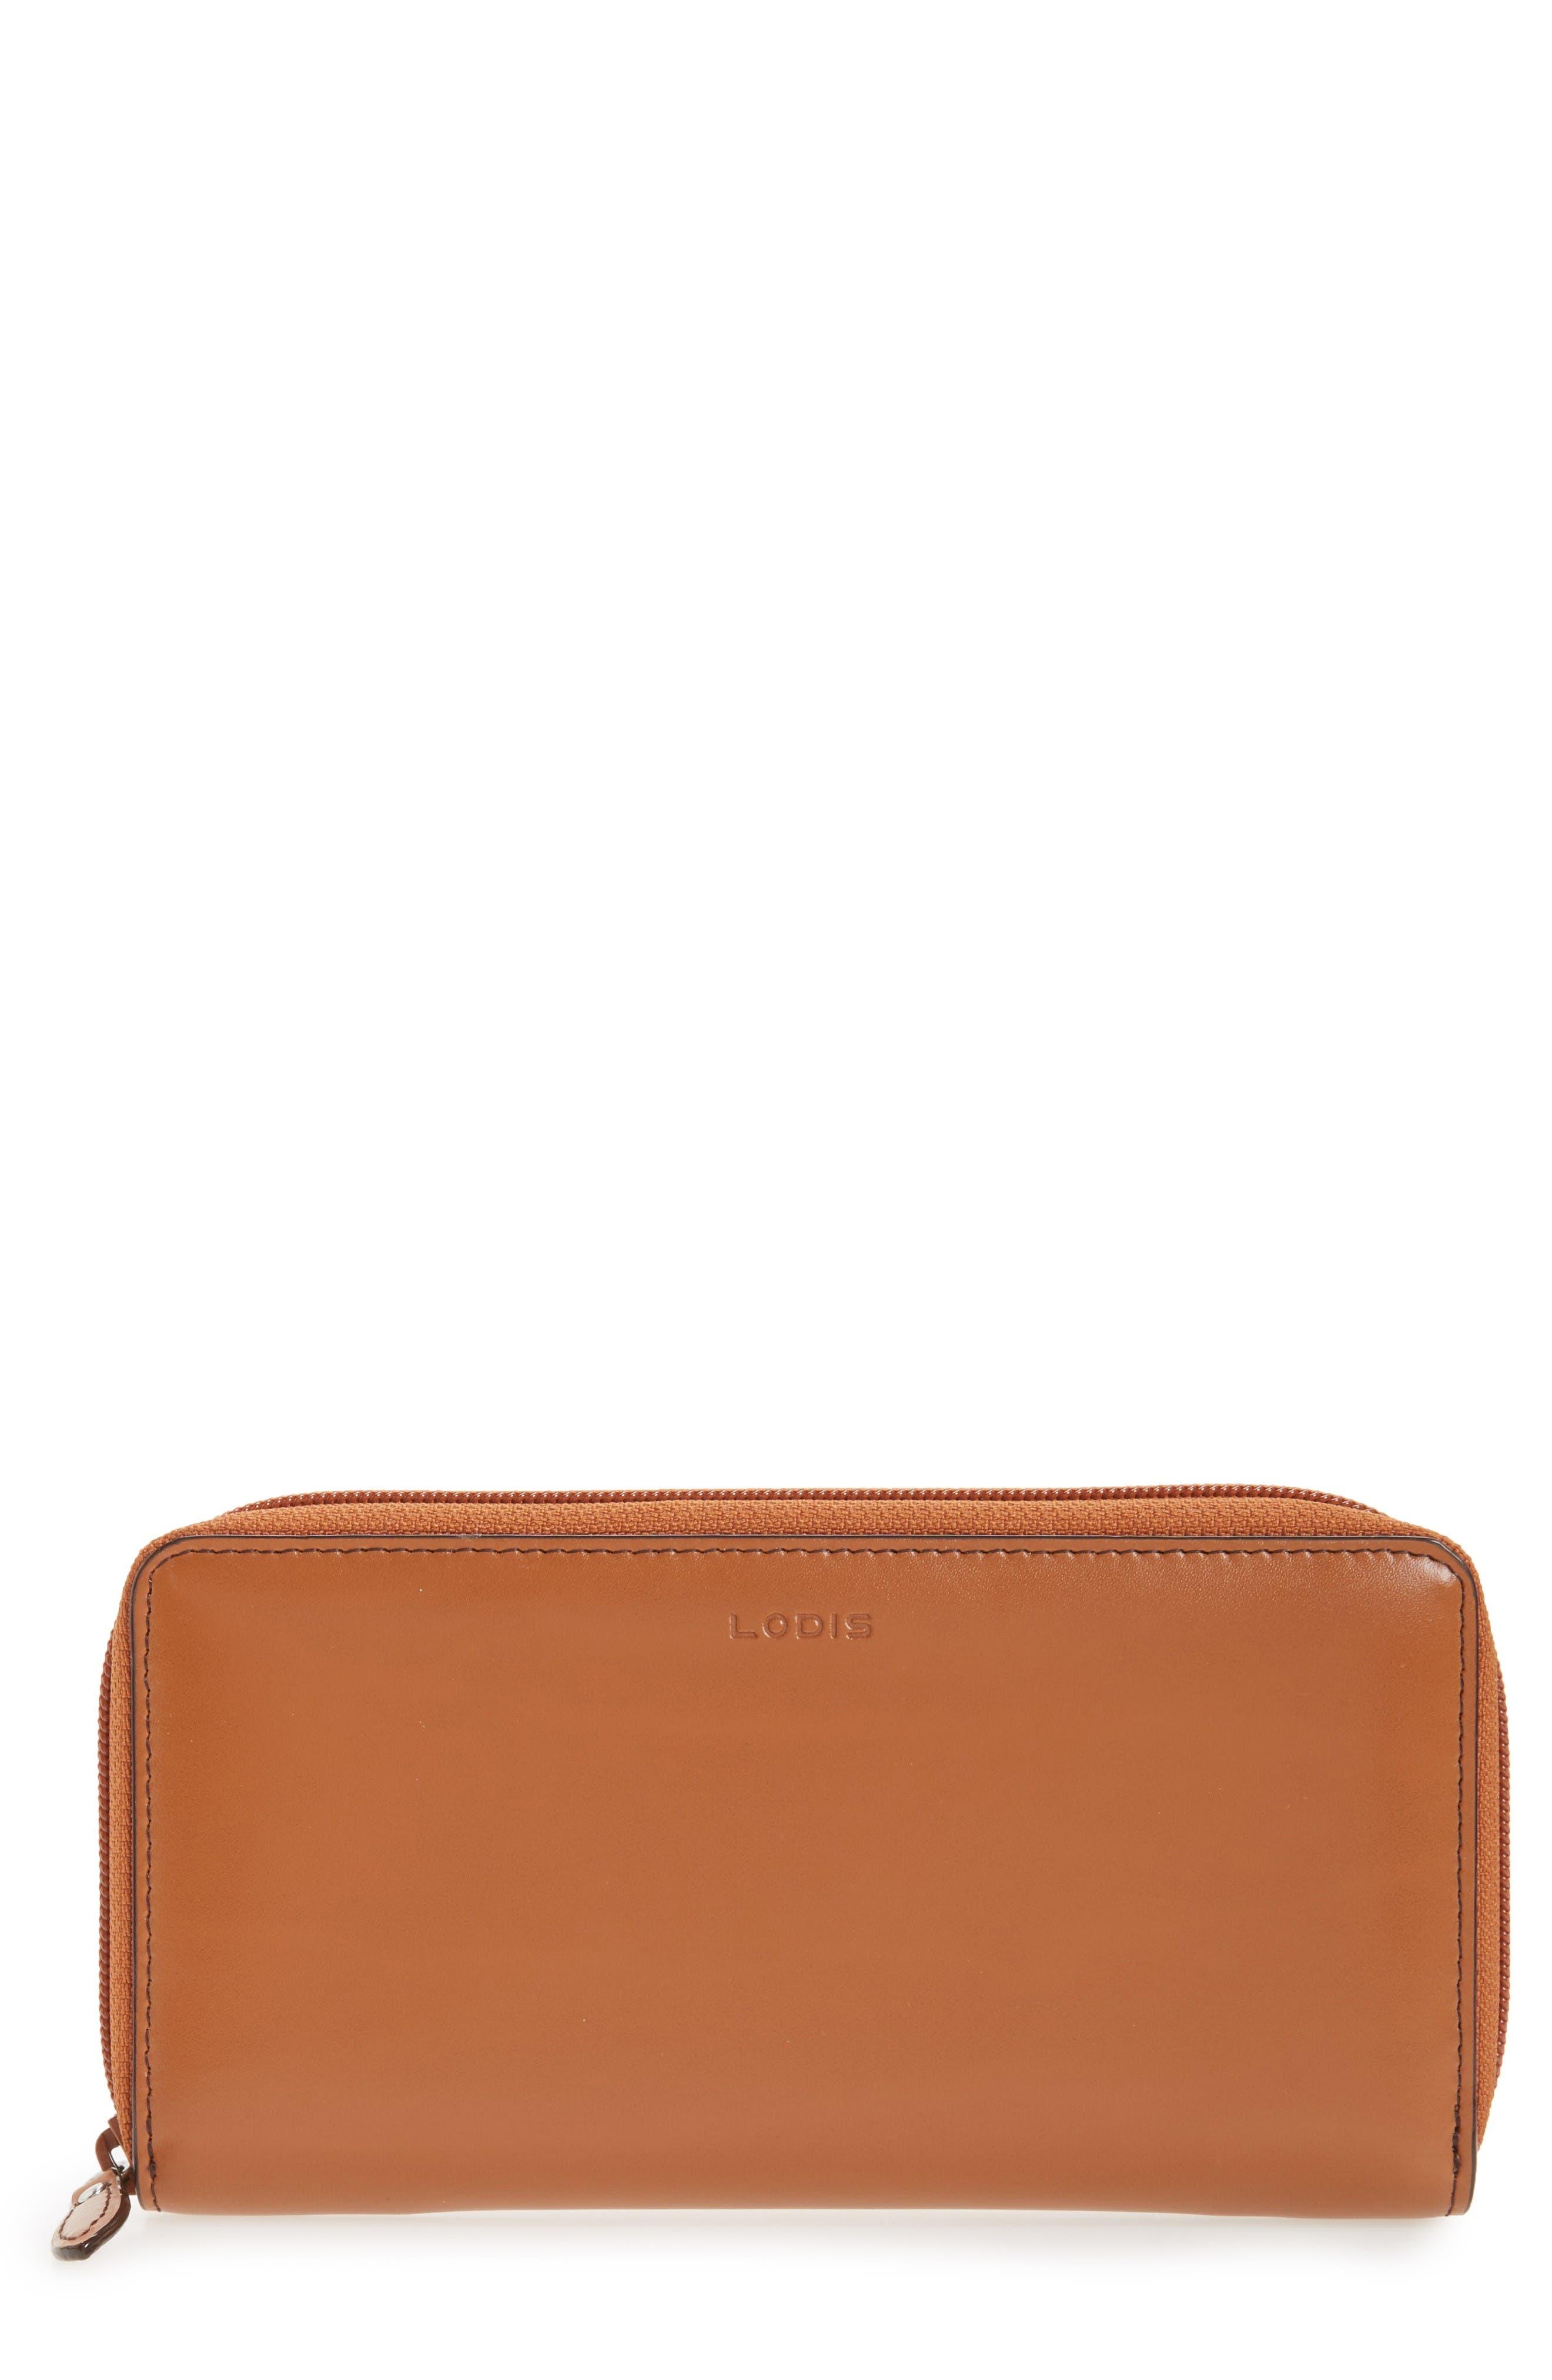 Lodis Ada RFID Zip Around Wallet